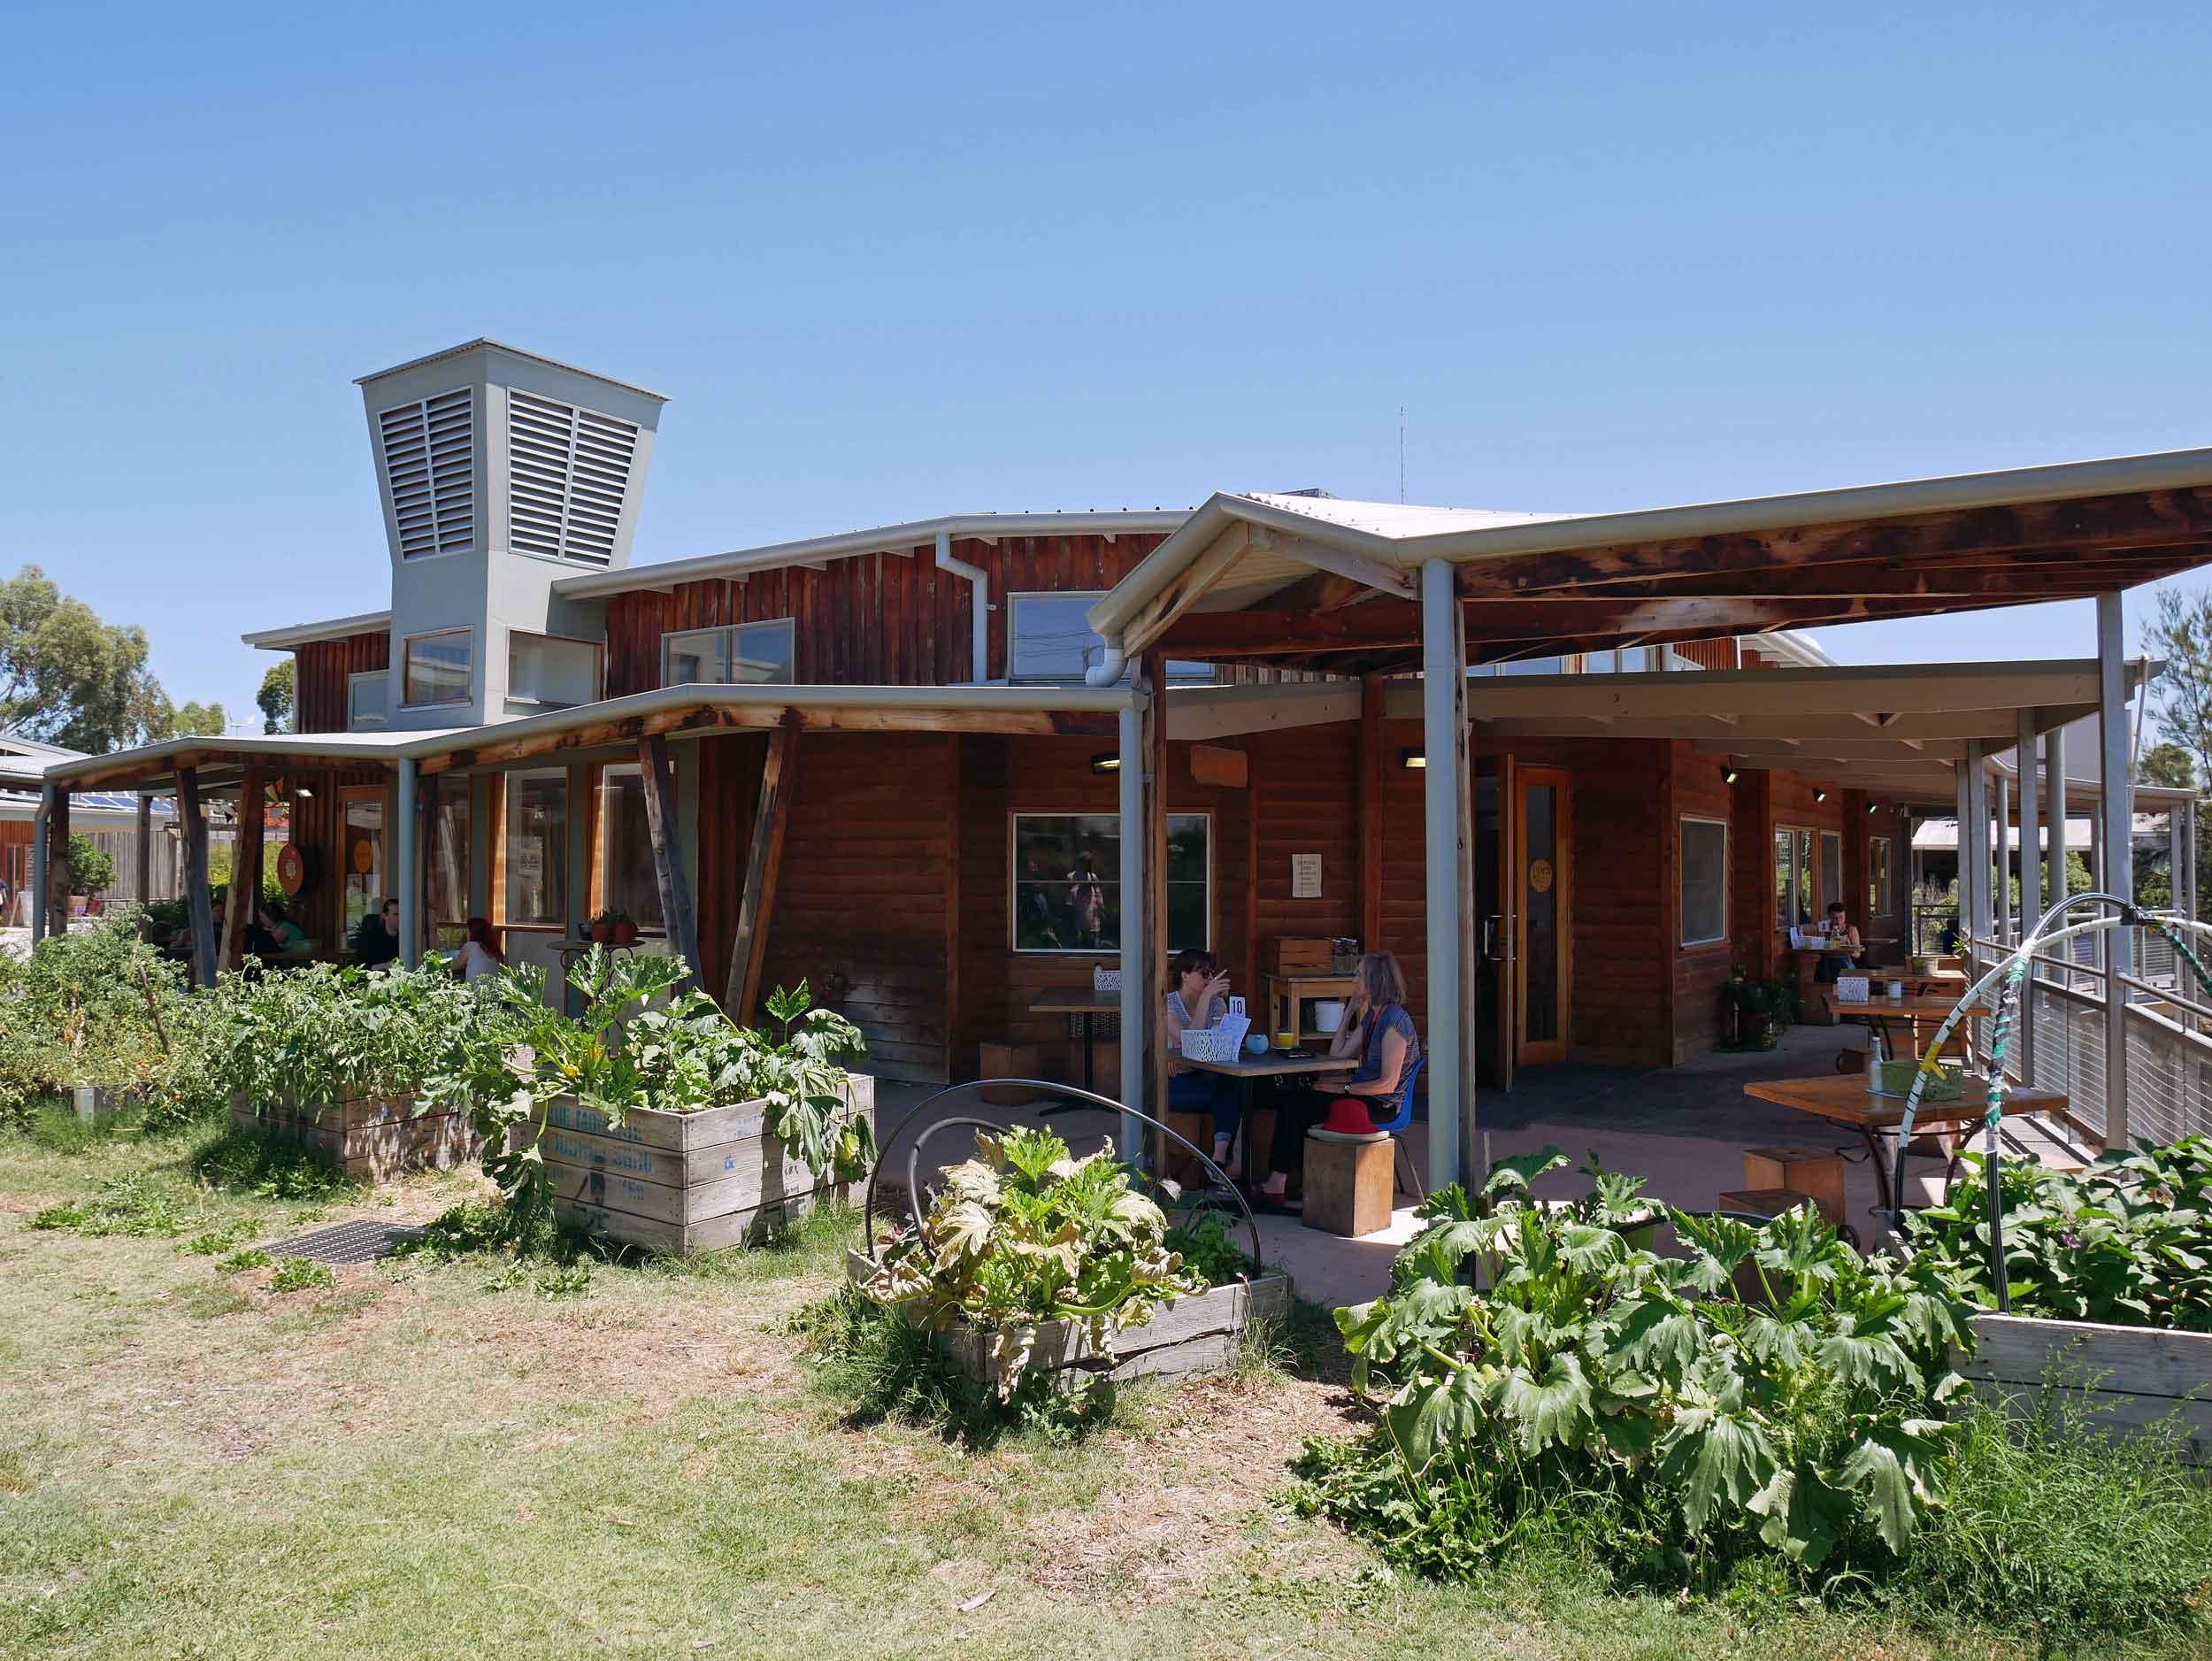 The non-profit CERES cafe, nursery and education center provides Melbourne a unique glimpse into sustainable living (Jan 26).